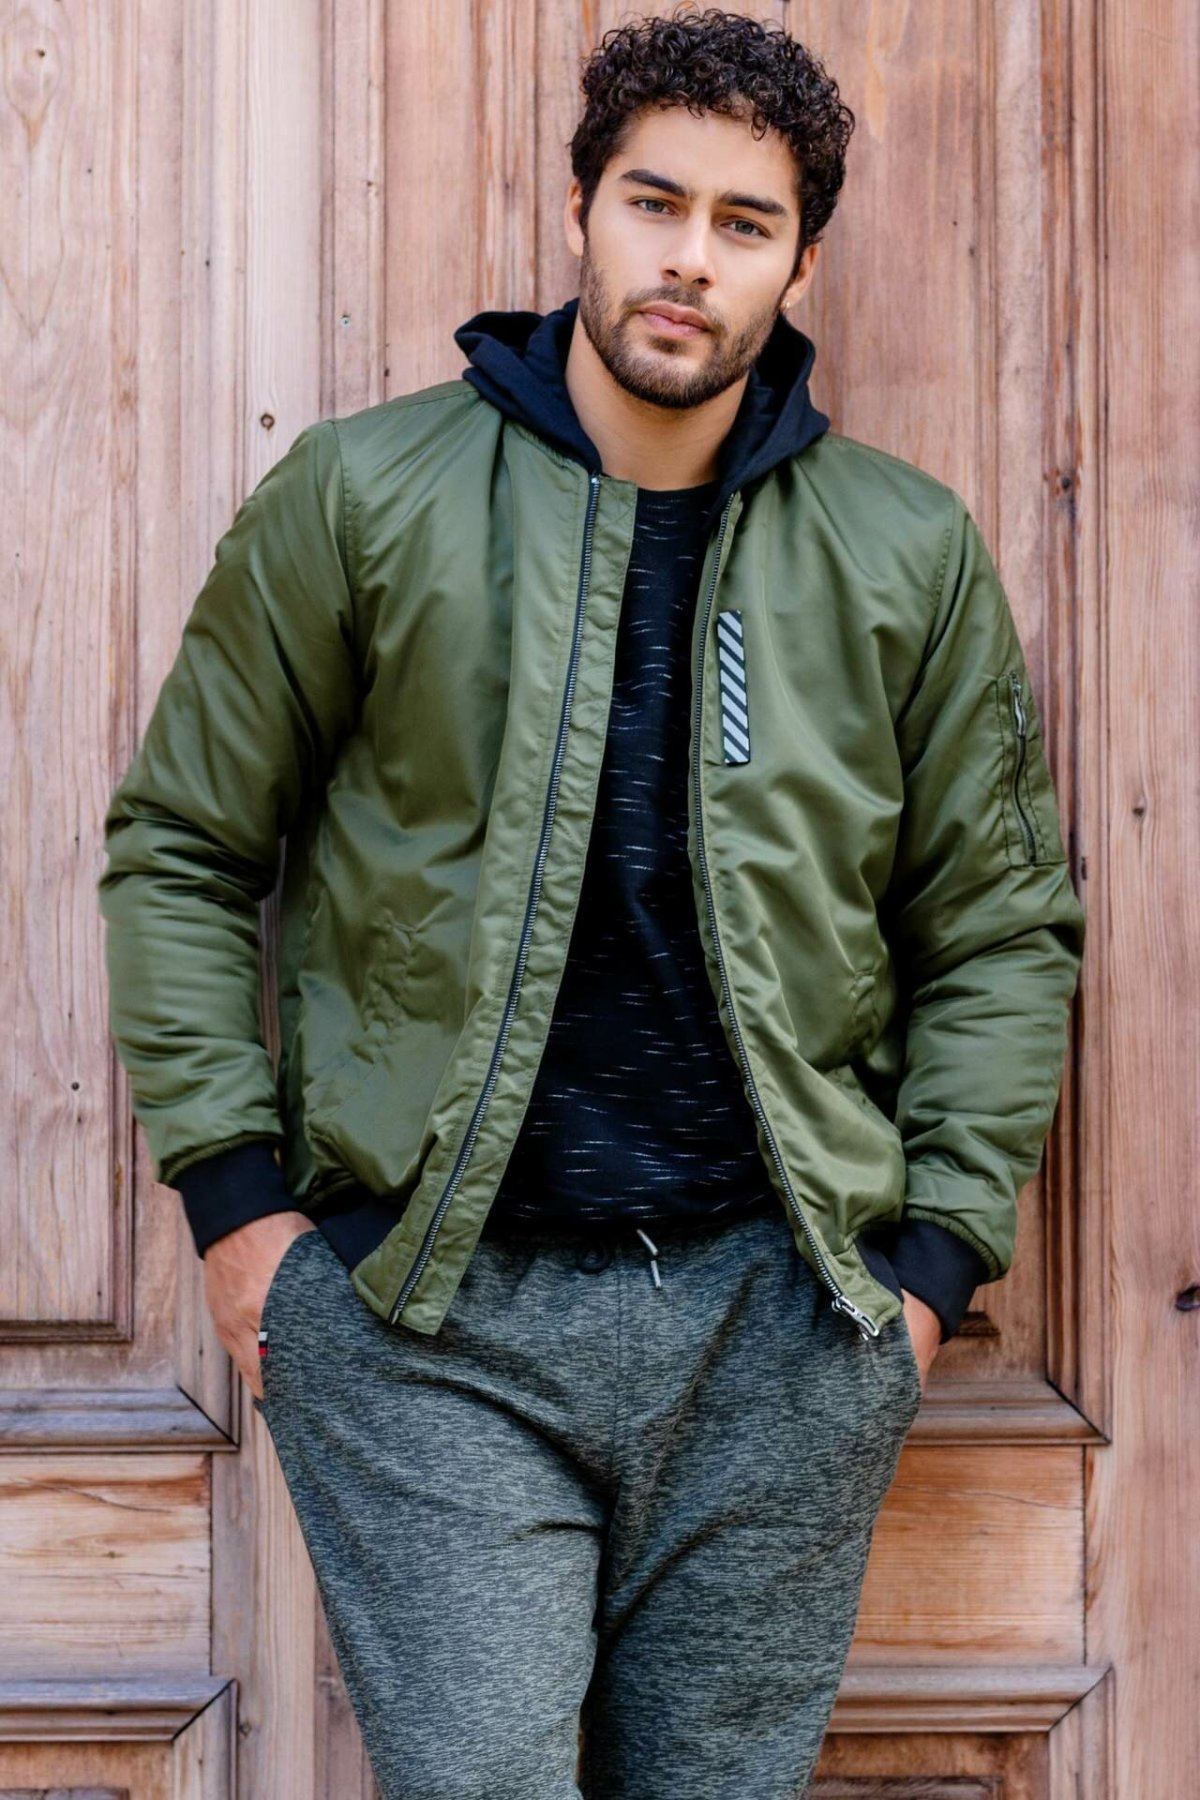 DeFacto Winter Autumn Outer Wear Army Green Mens Thick Warm Jacket Mont Stand Collar Jacket Coat I8047AZ18WNKH215-I8047AZ18WN